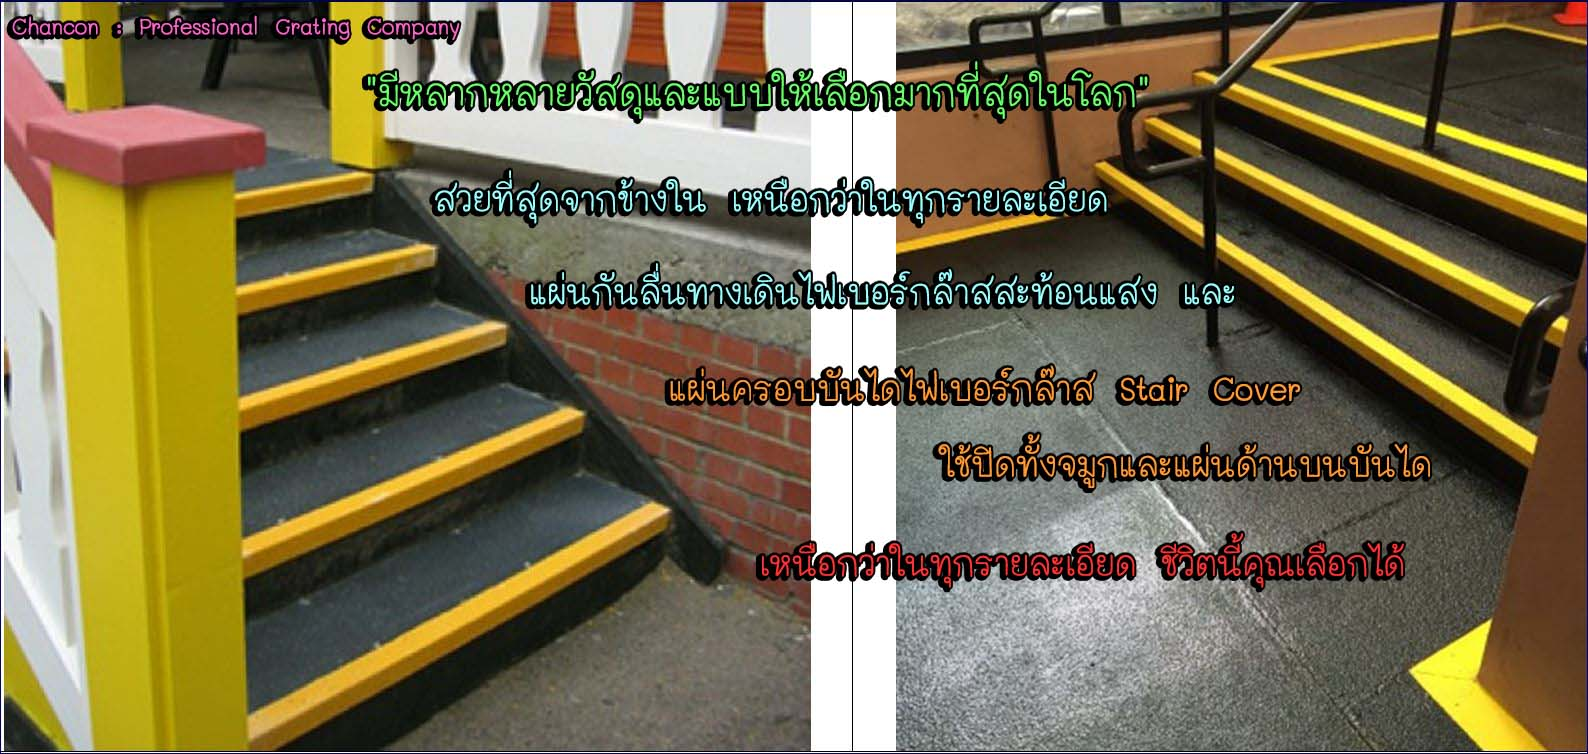 Stair Tread Nosing Step Cover แผ่นปิดจมูกขอบมุมคิ้วแผงครอบบันได